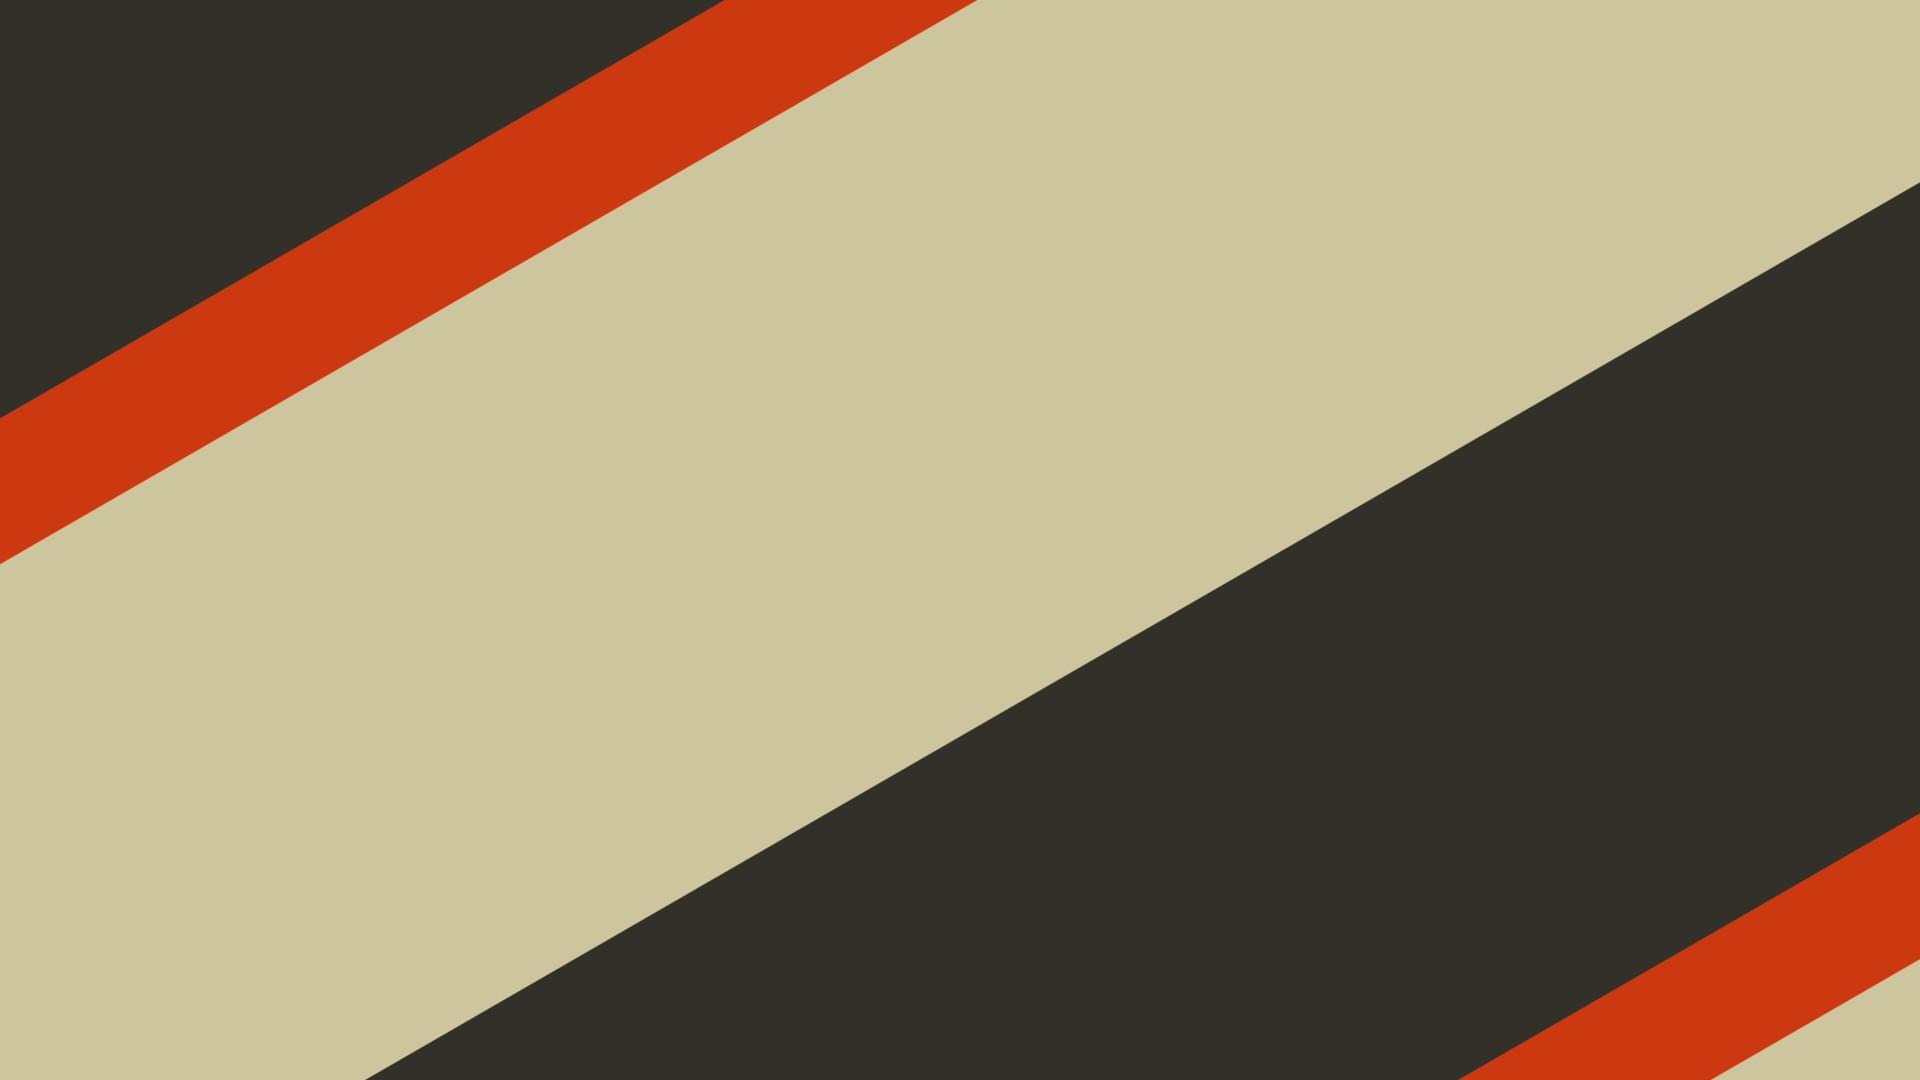 Minimalistic Stripes Desktop Wallpaper